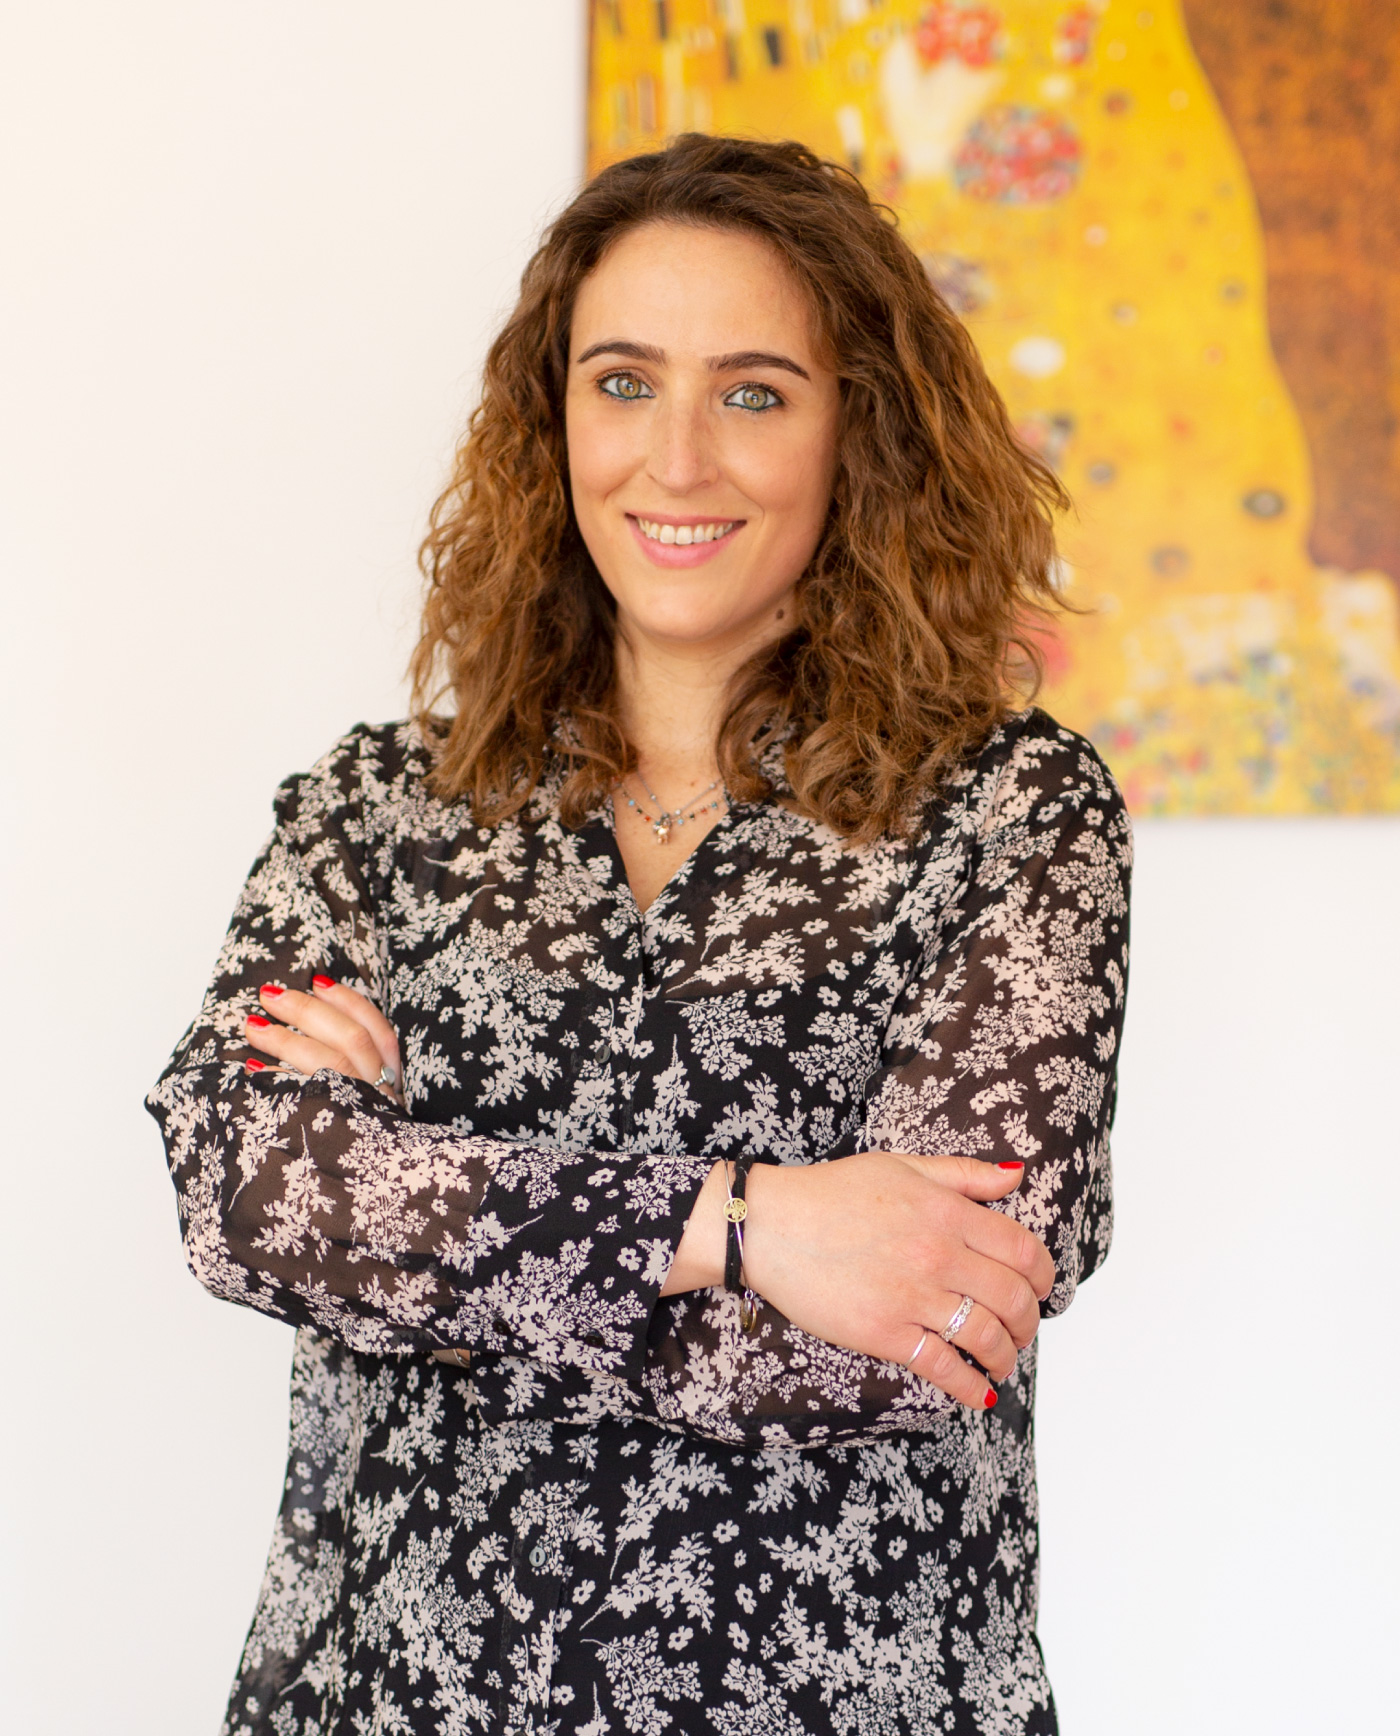 Dott.ssa Giuseppina De Luca